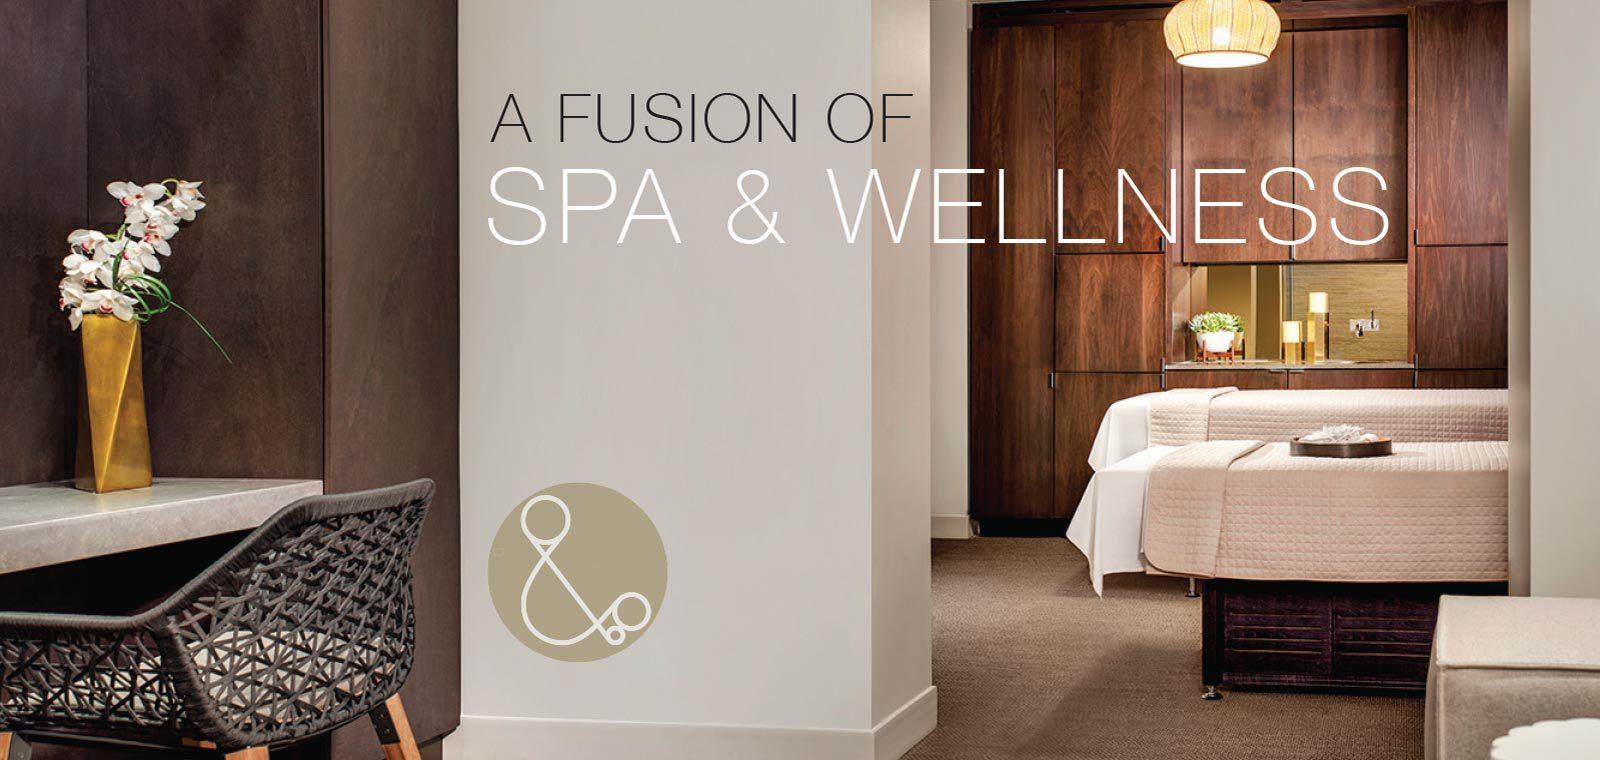 A fusion of spa & wellness